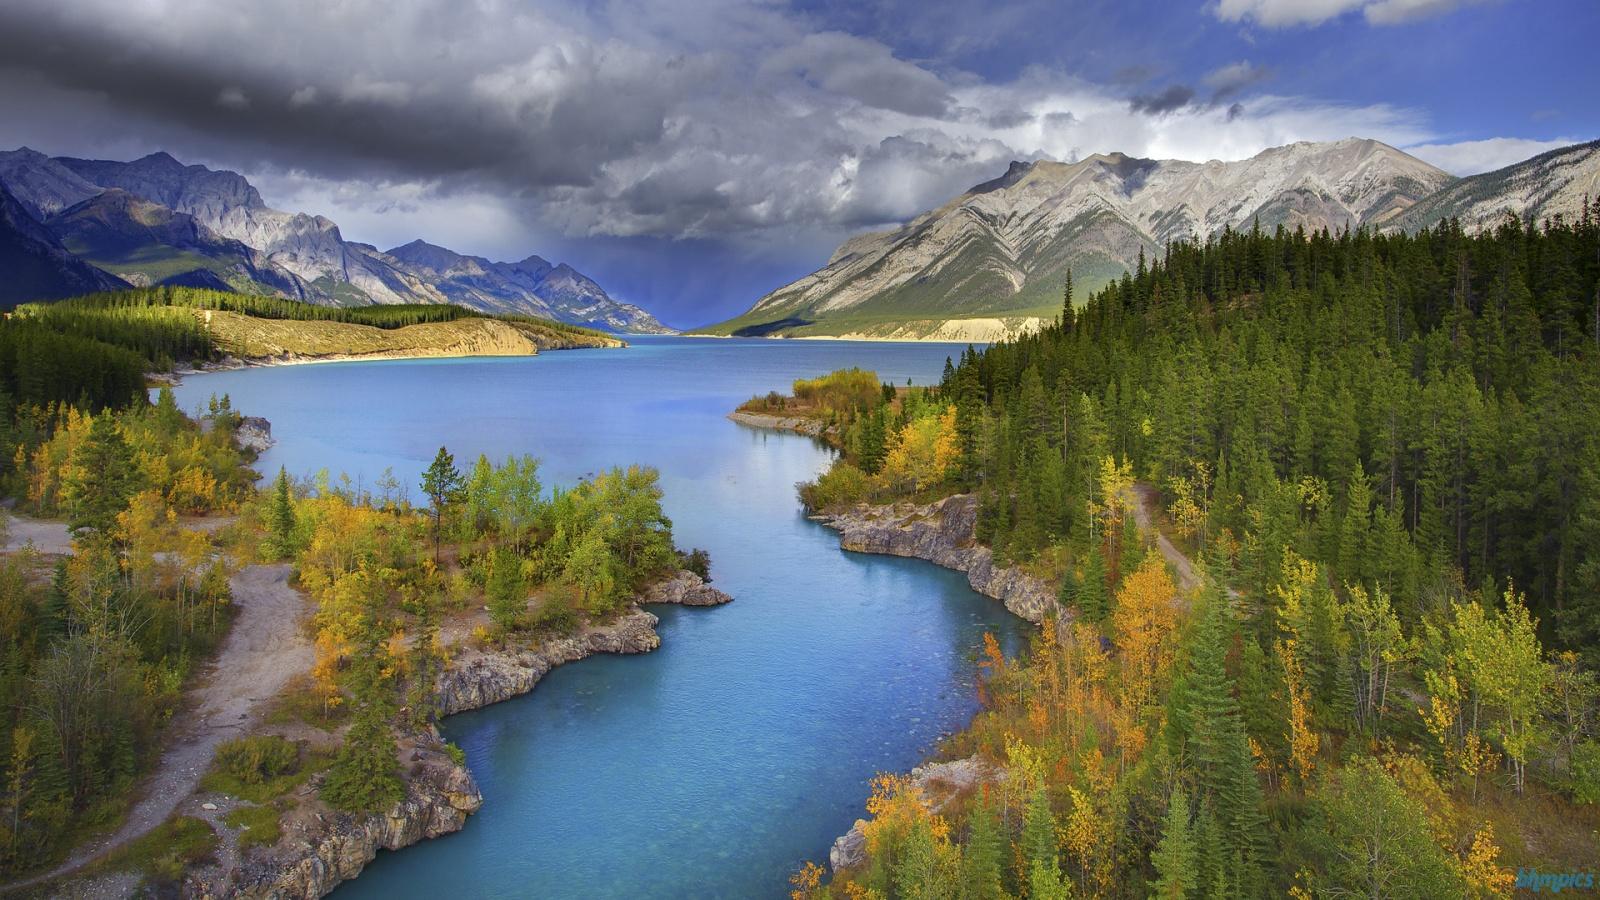 Abraham-lake-canada